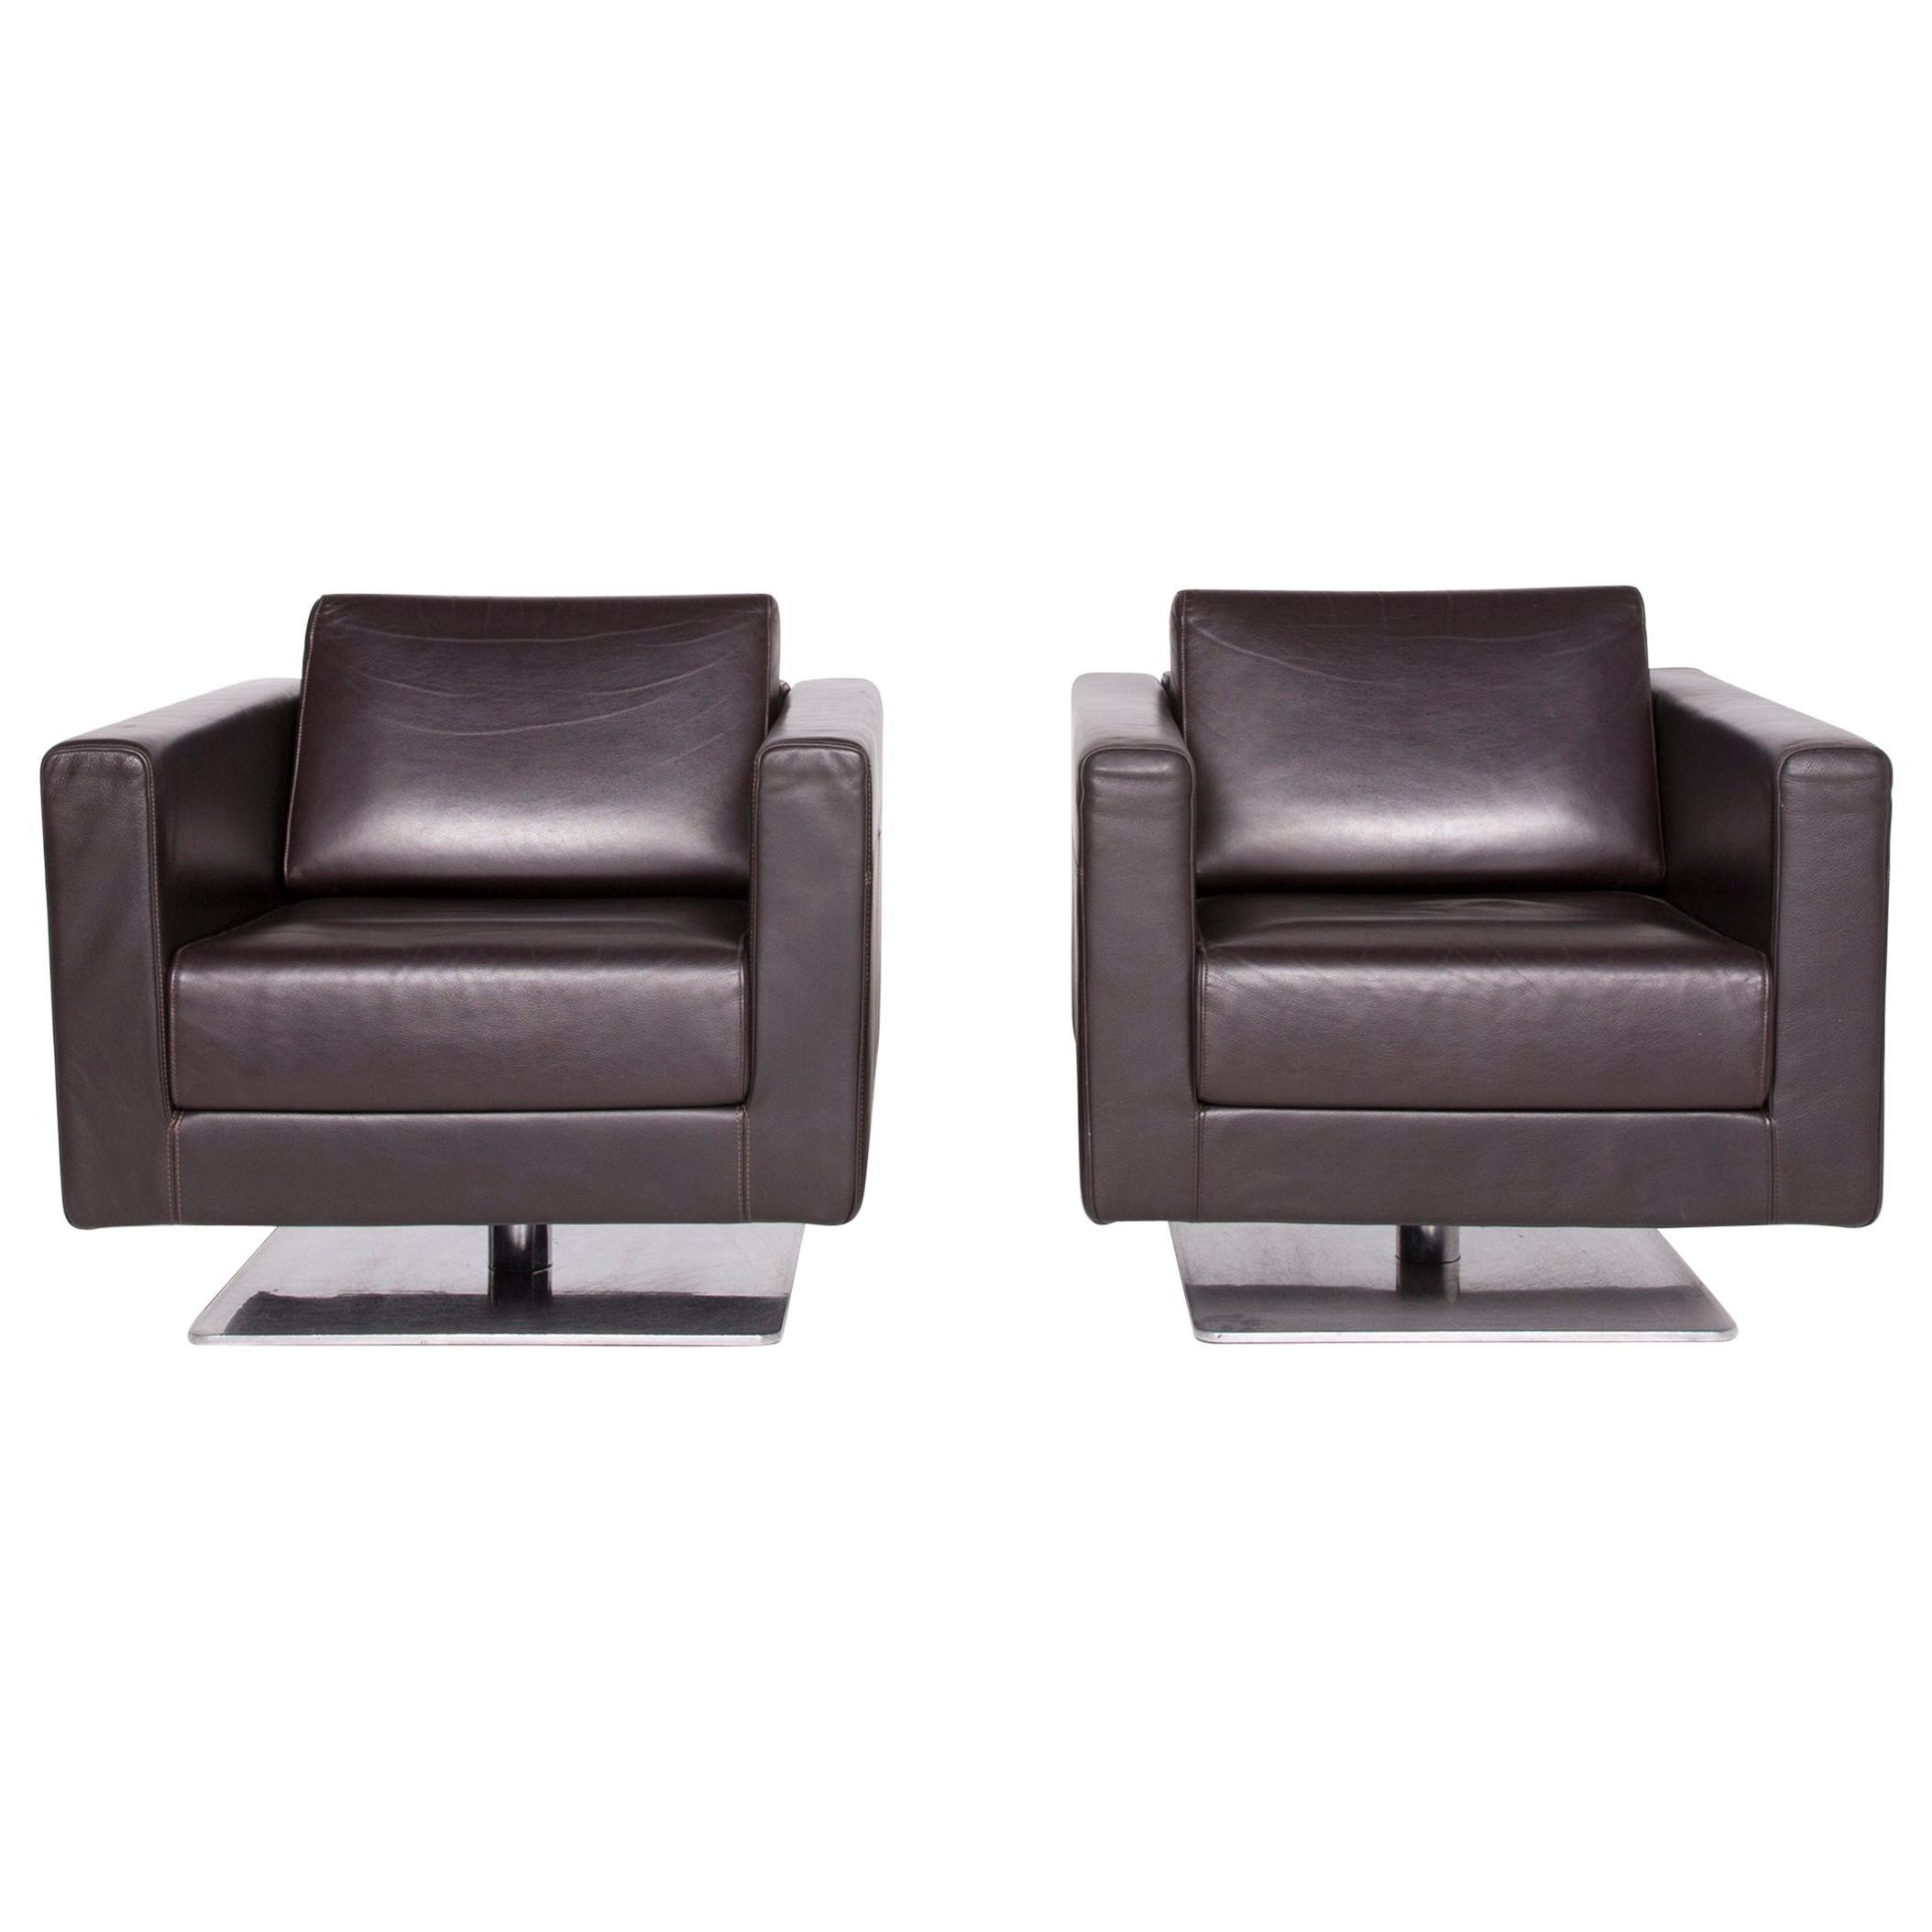 Vitra Park Swivel Armchair 2x Designer Armchair Set Leather Brown Chocolate